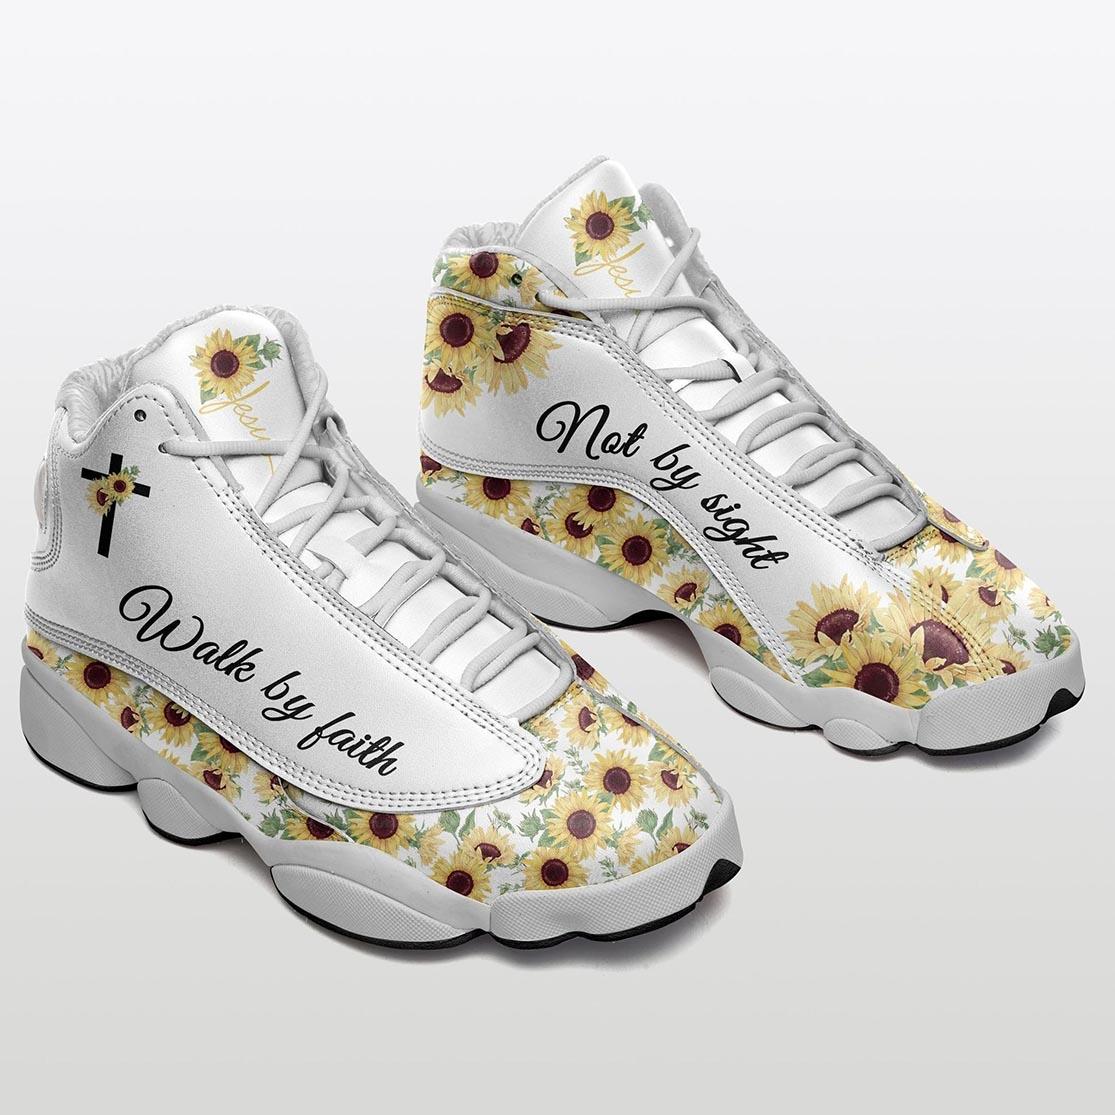 Walk by faith Sunflower AJD 13 sneaker